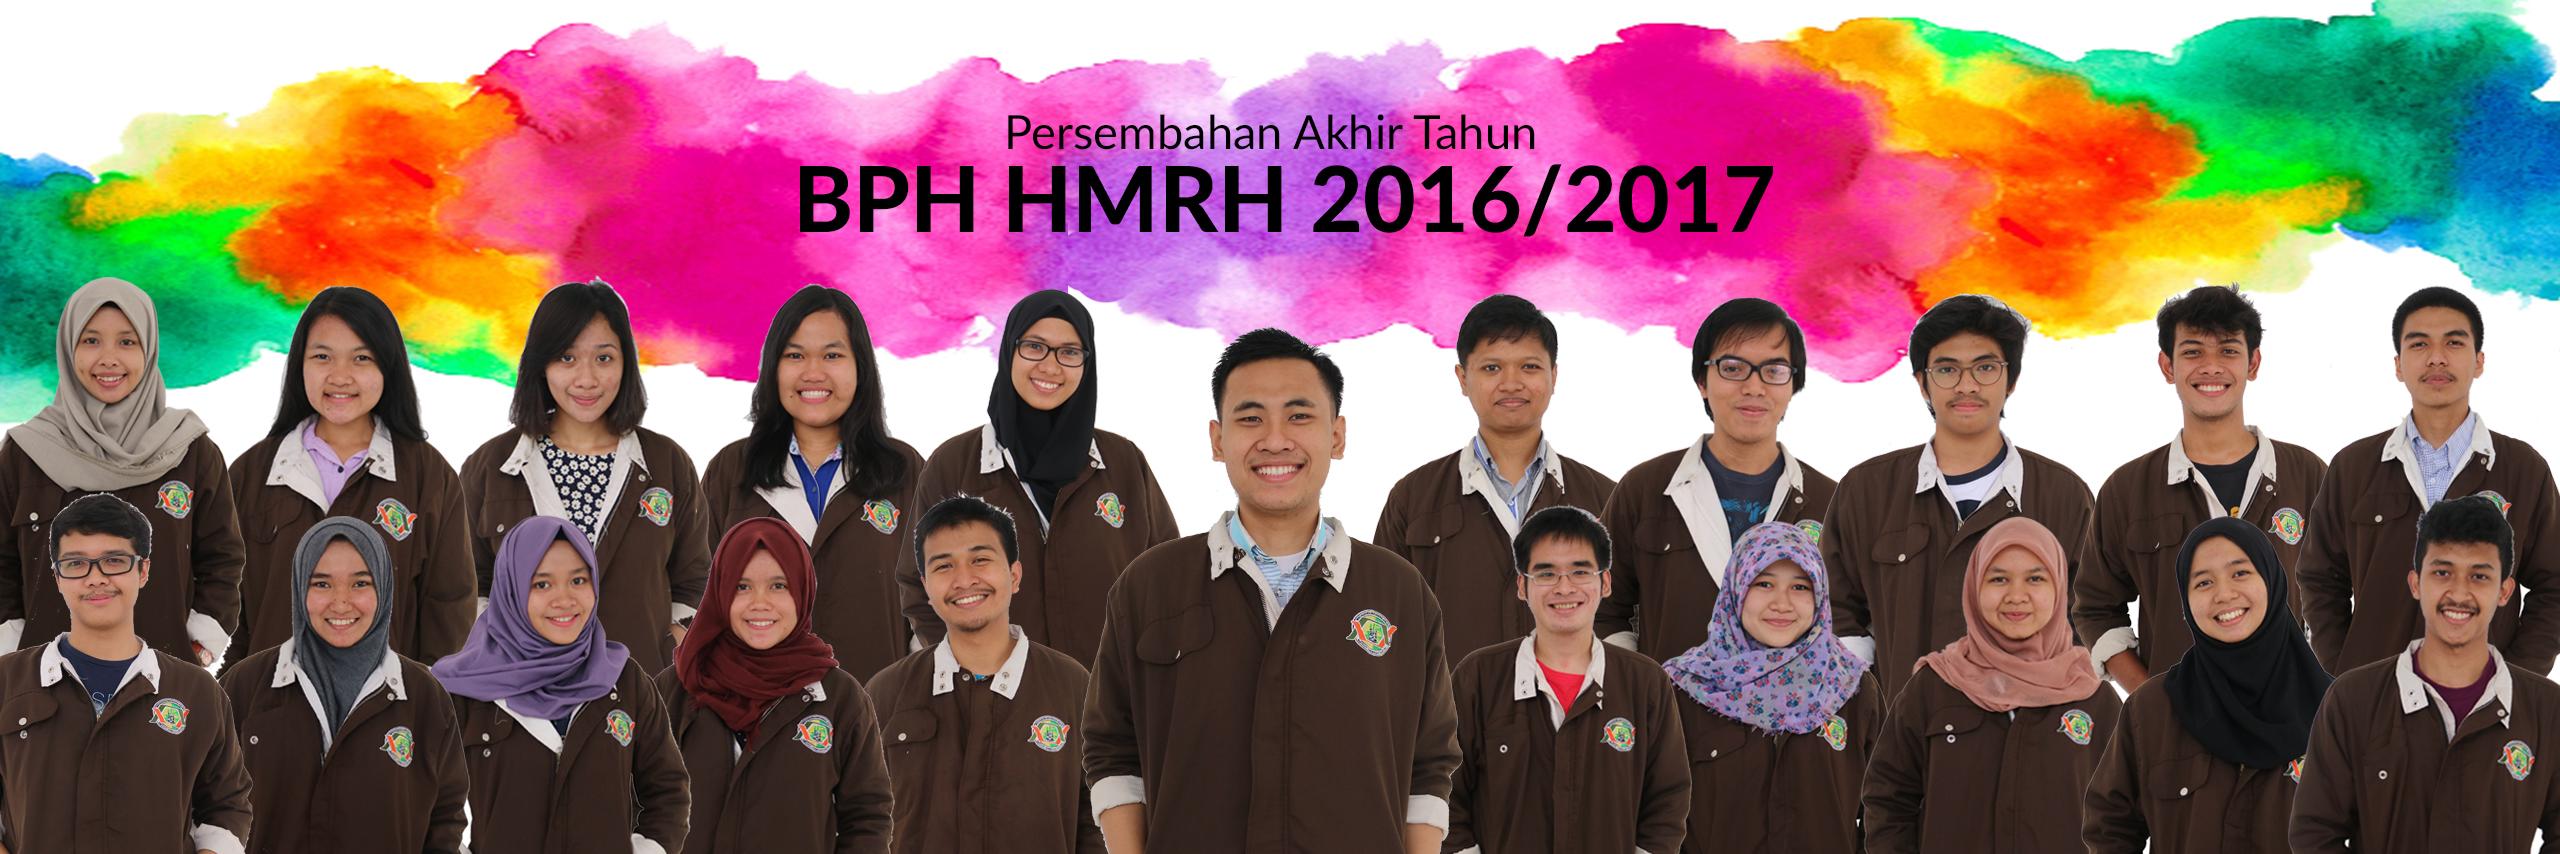 Sebuah Semangat : HMRH Peduli, Responsif dan Produktif